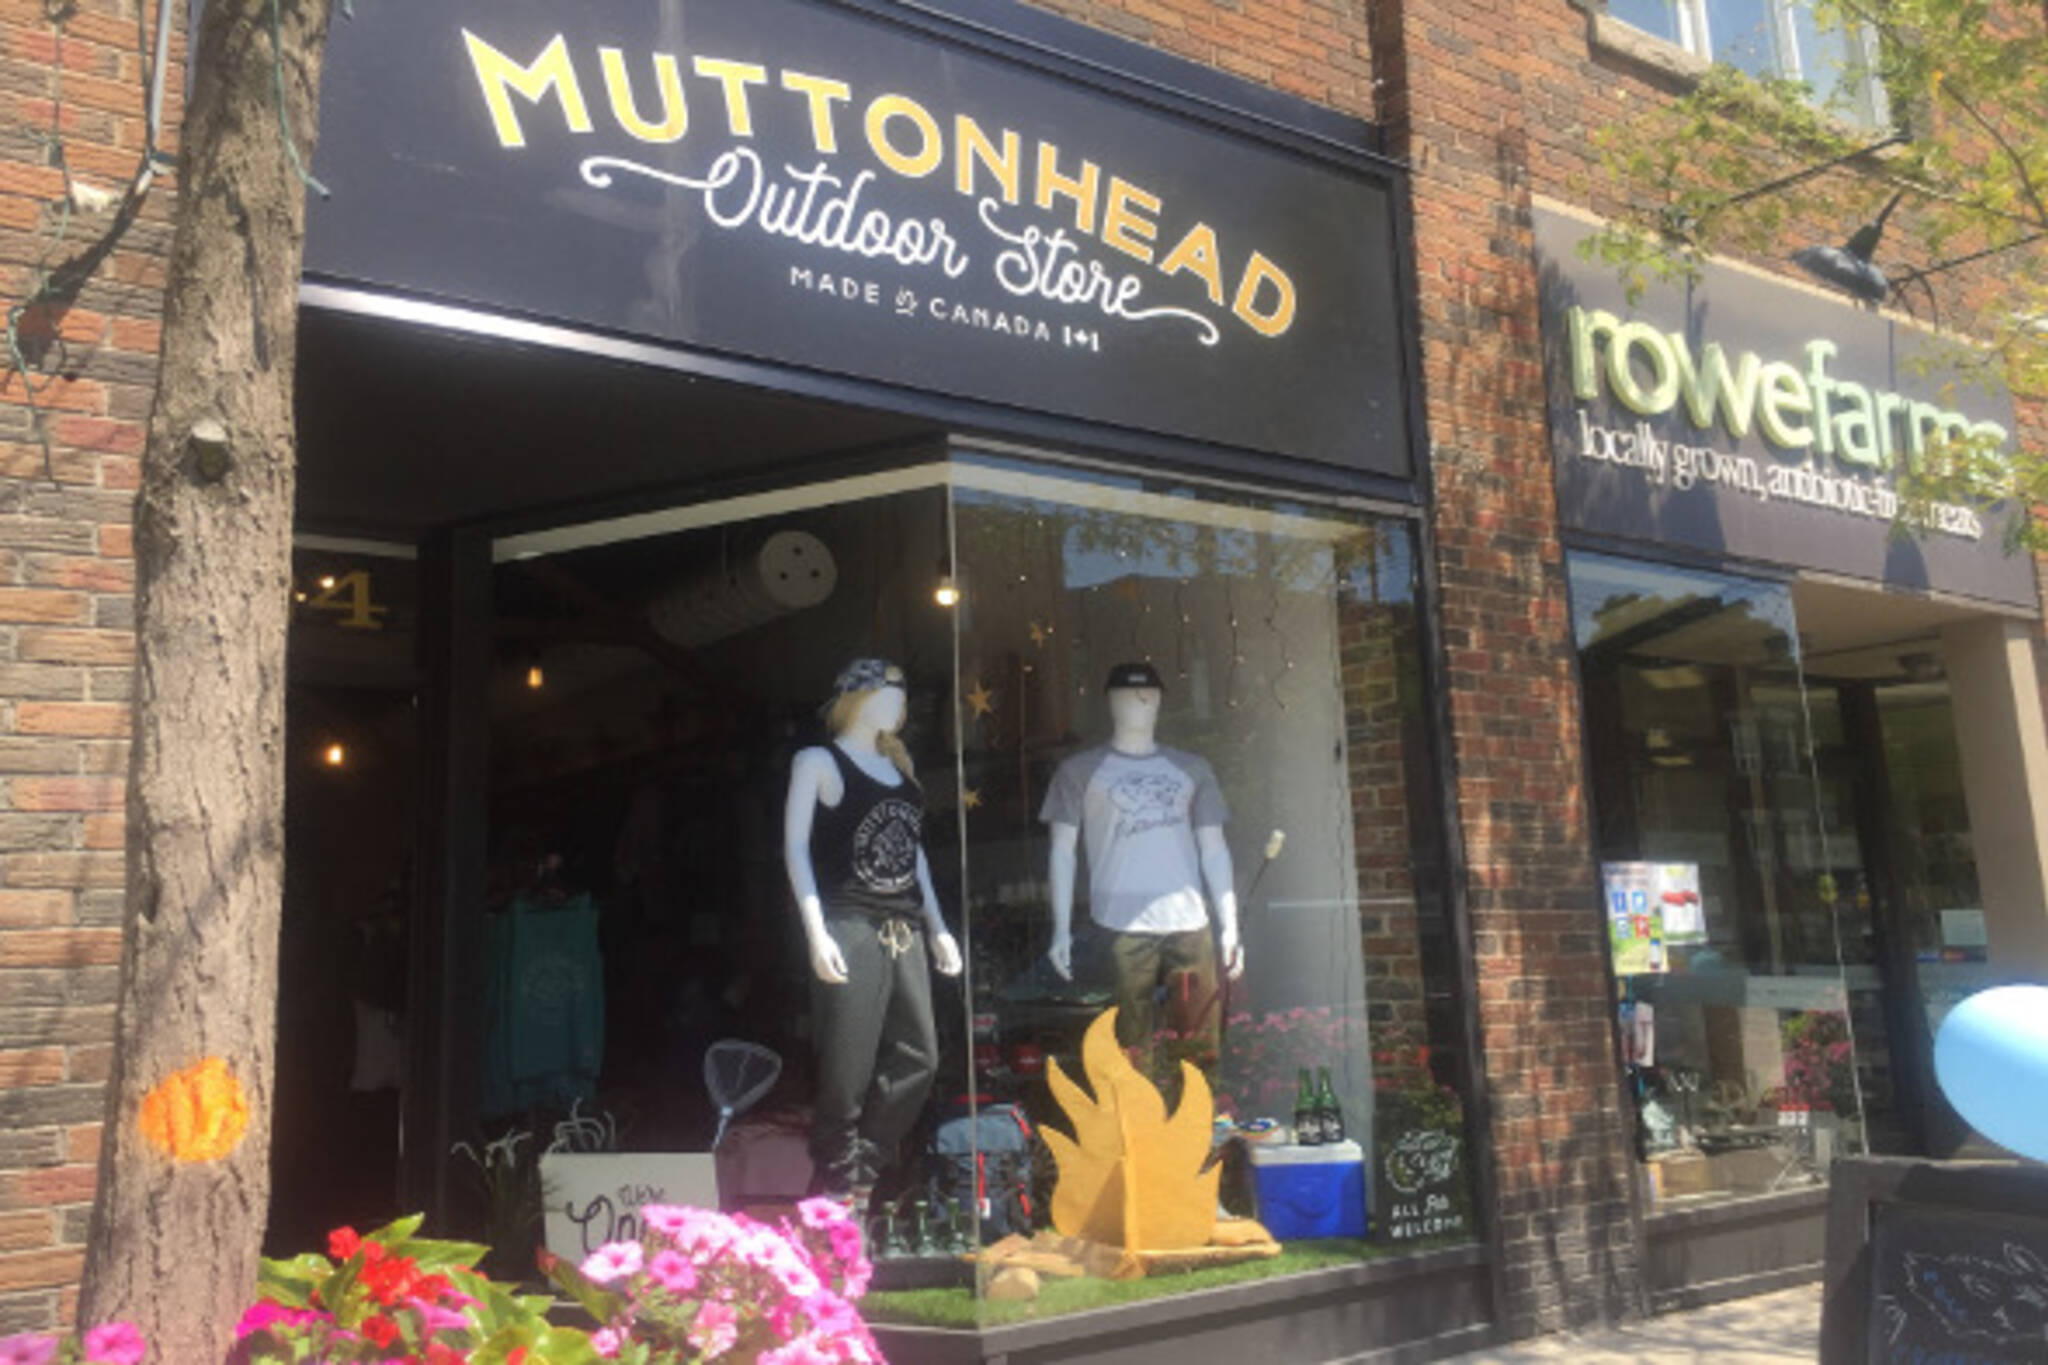 Muttonhead